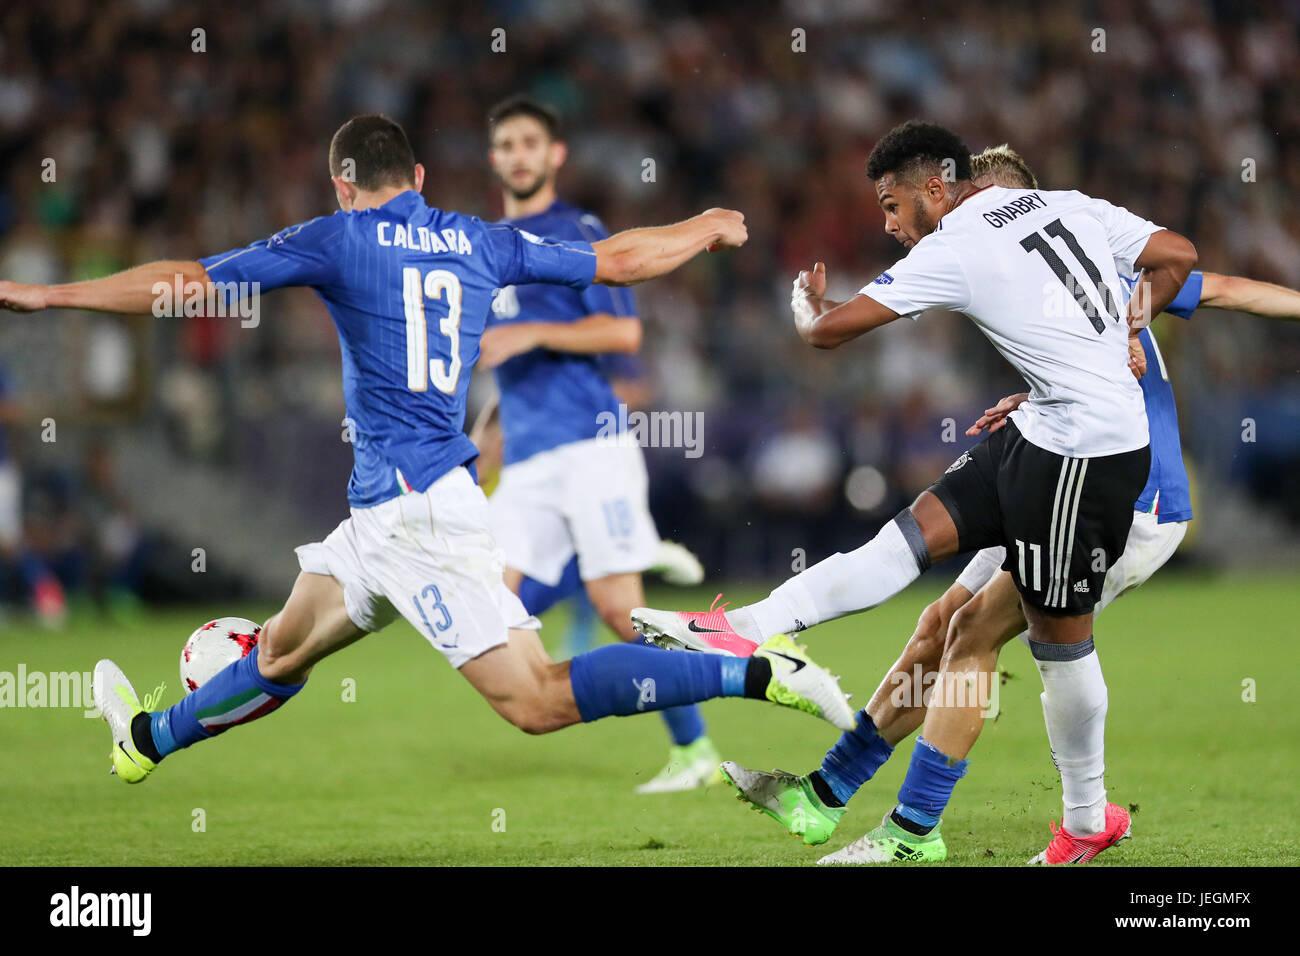 Cracow, Poland. 21st June, 2017. Italian Mattia Caldara (L) foils an attempt on the Italian goal by German player - Stock Image